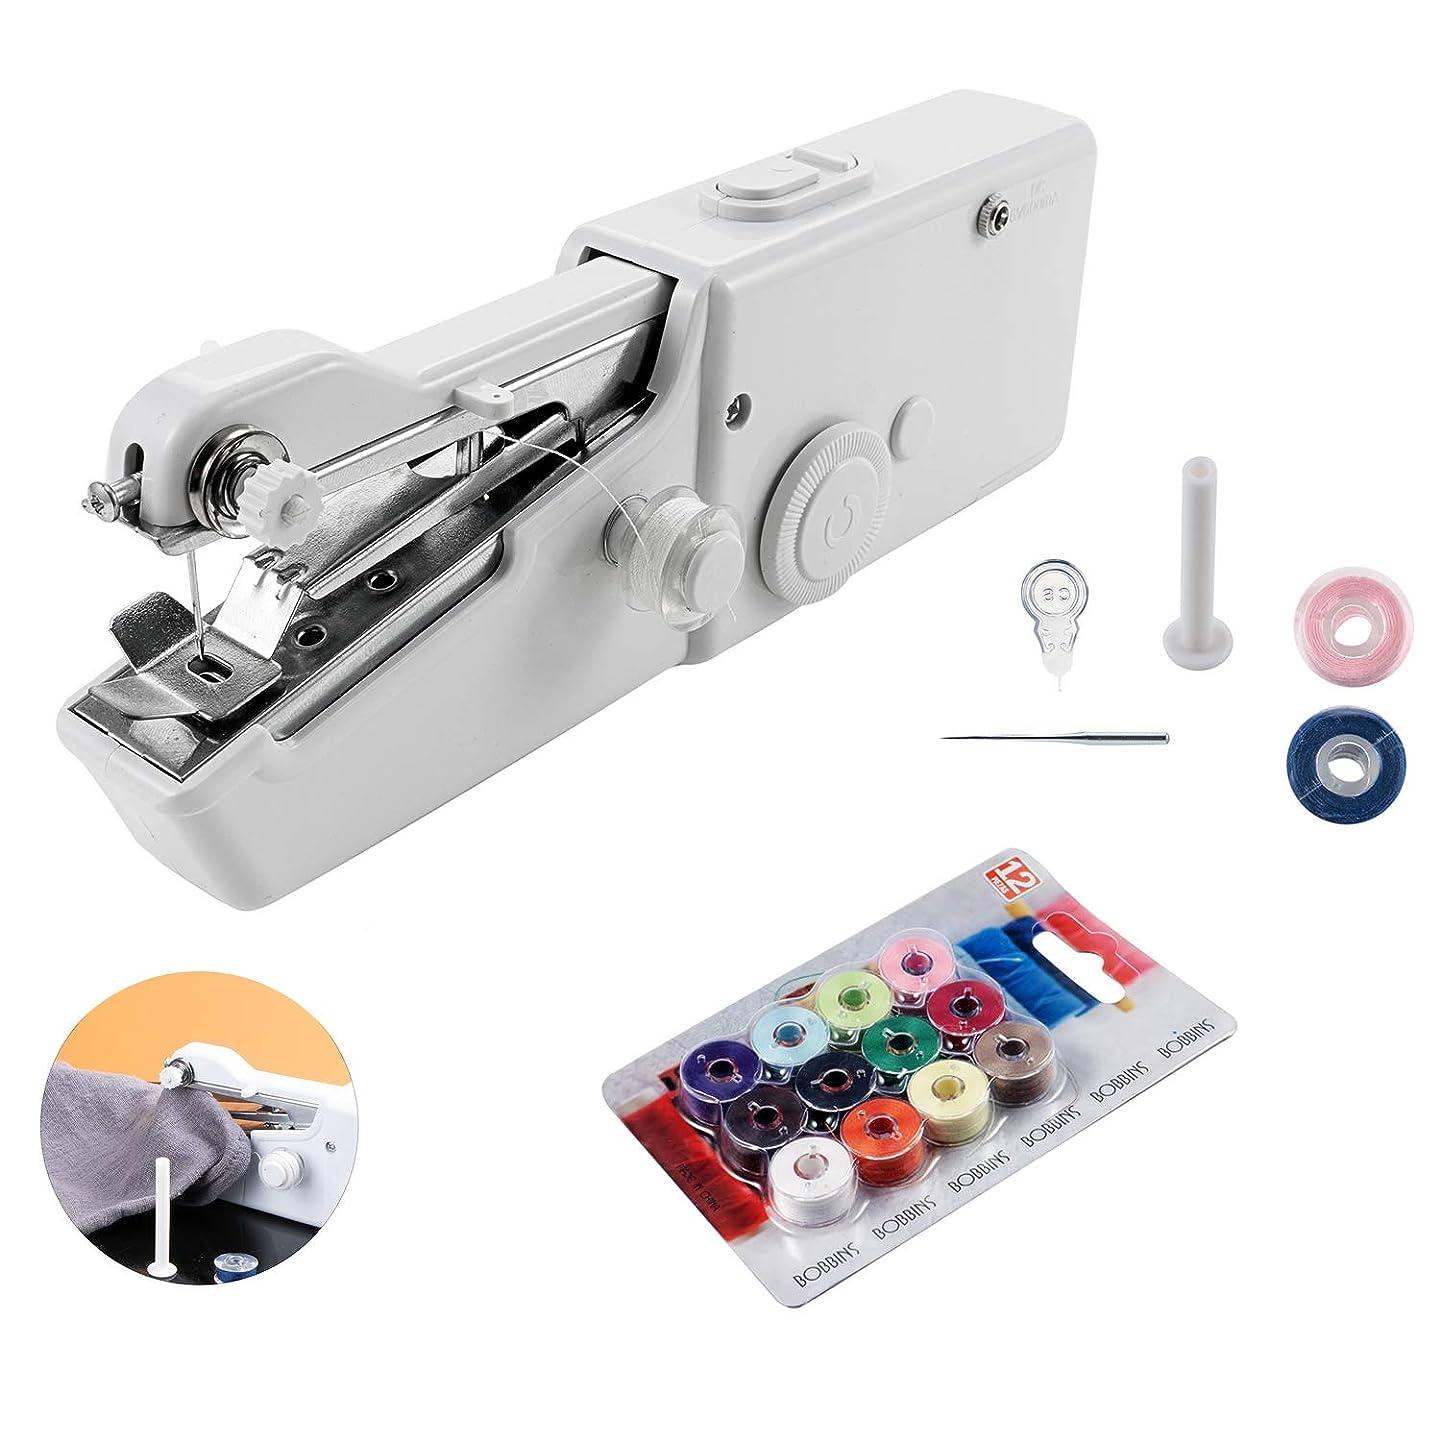 Mini Handheld Sewing Machine, Portable Handy Stitch Electric Crafting Mending Machine for Quick Repairs Household Tool fejrzgzsylhe